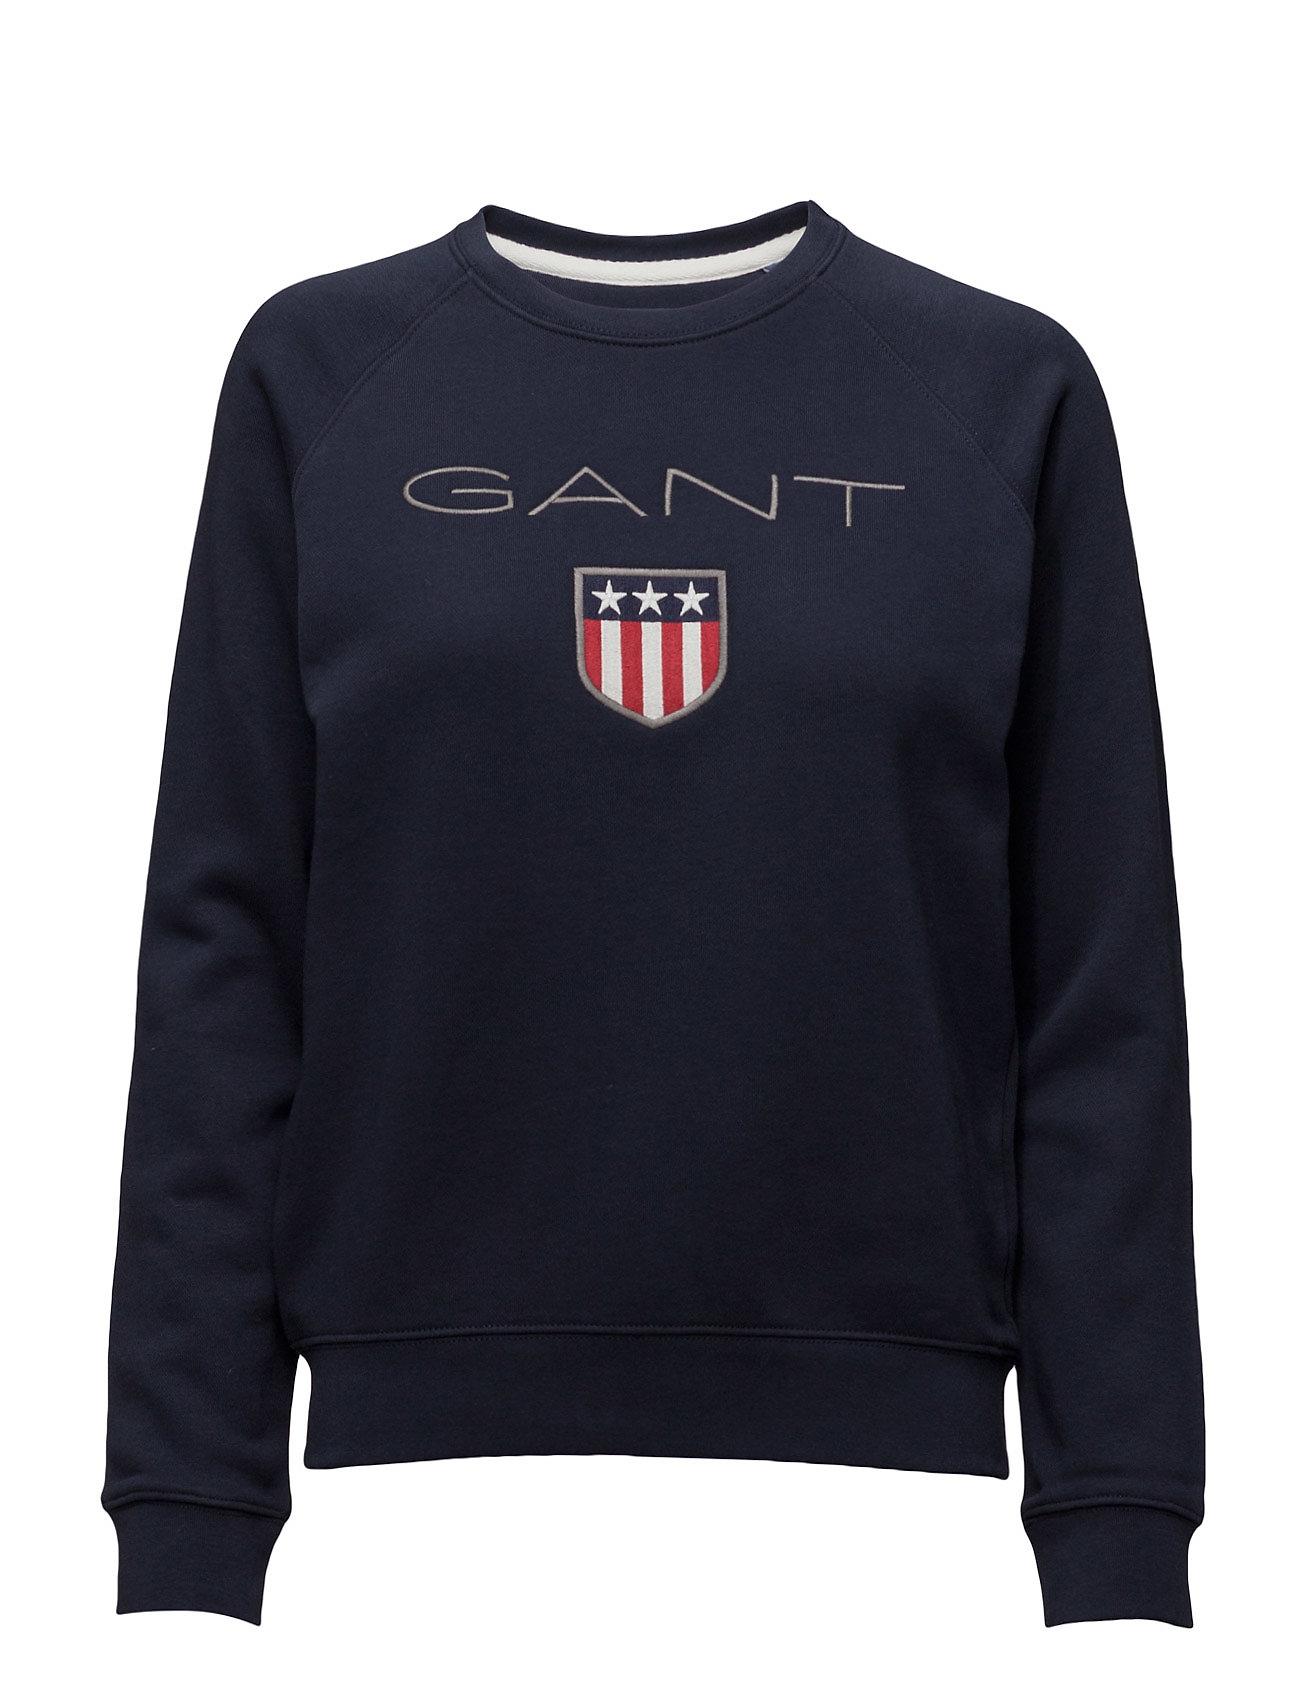 GANT GANT SHIELD LOGO C-NECK SWEAT - EVENING BLUE